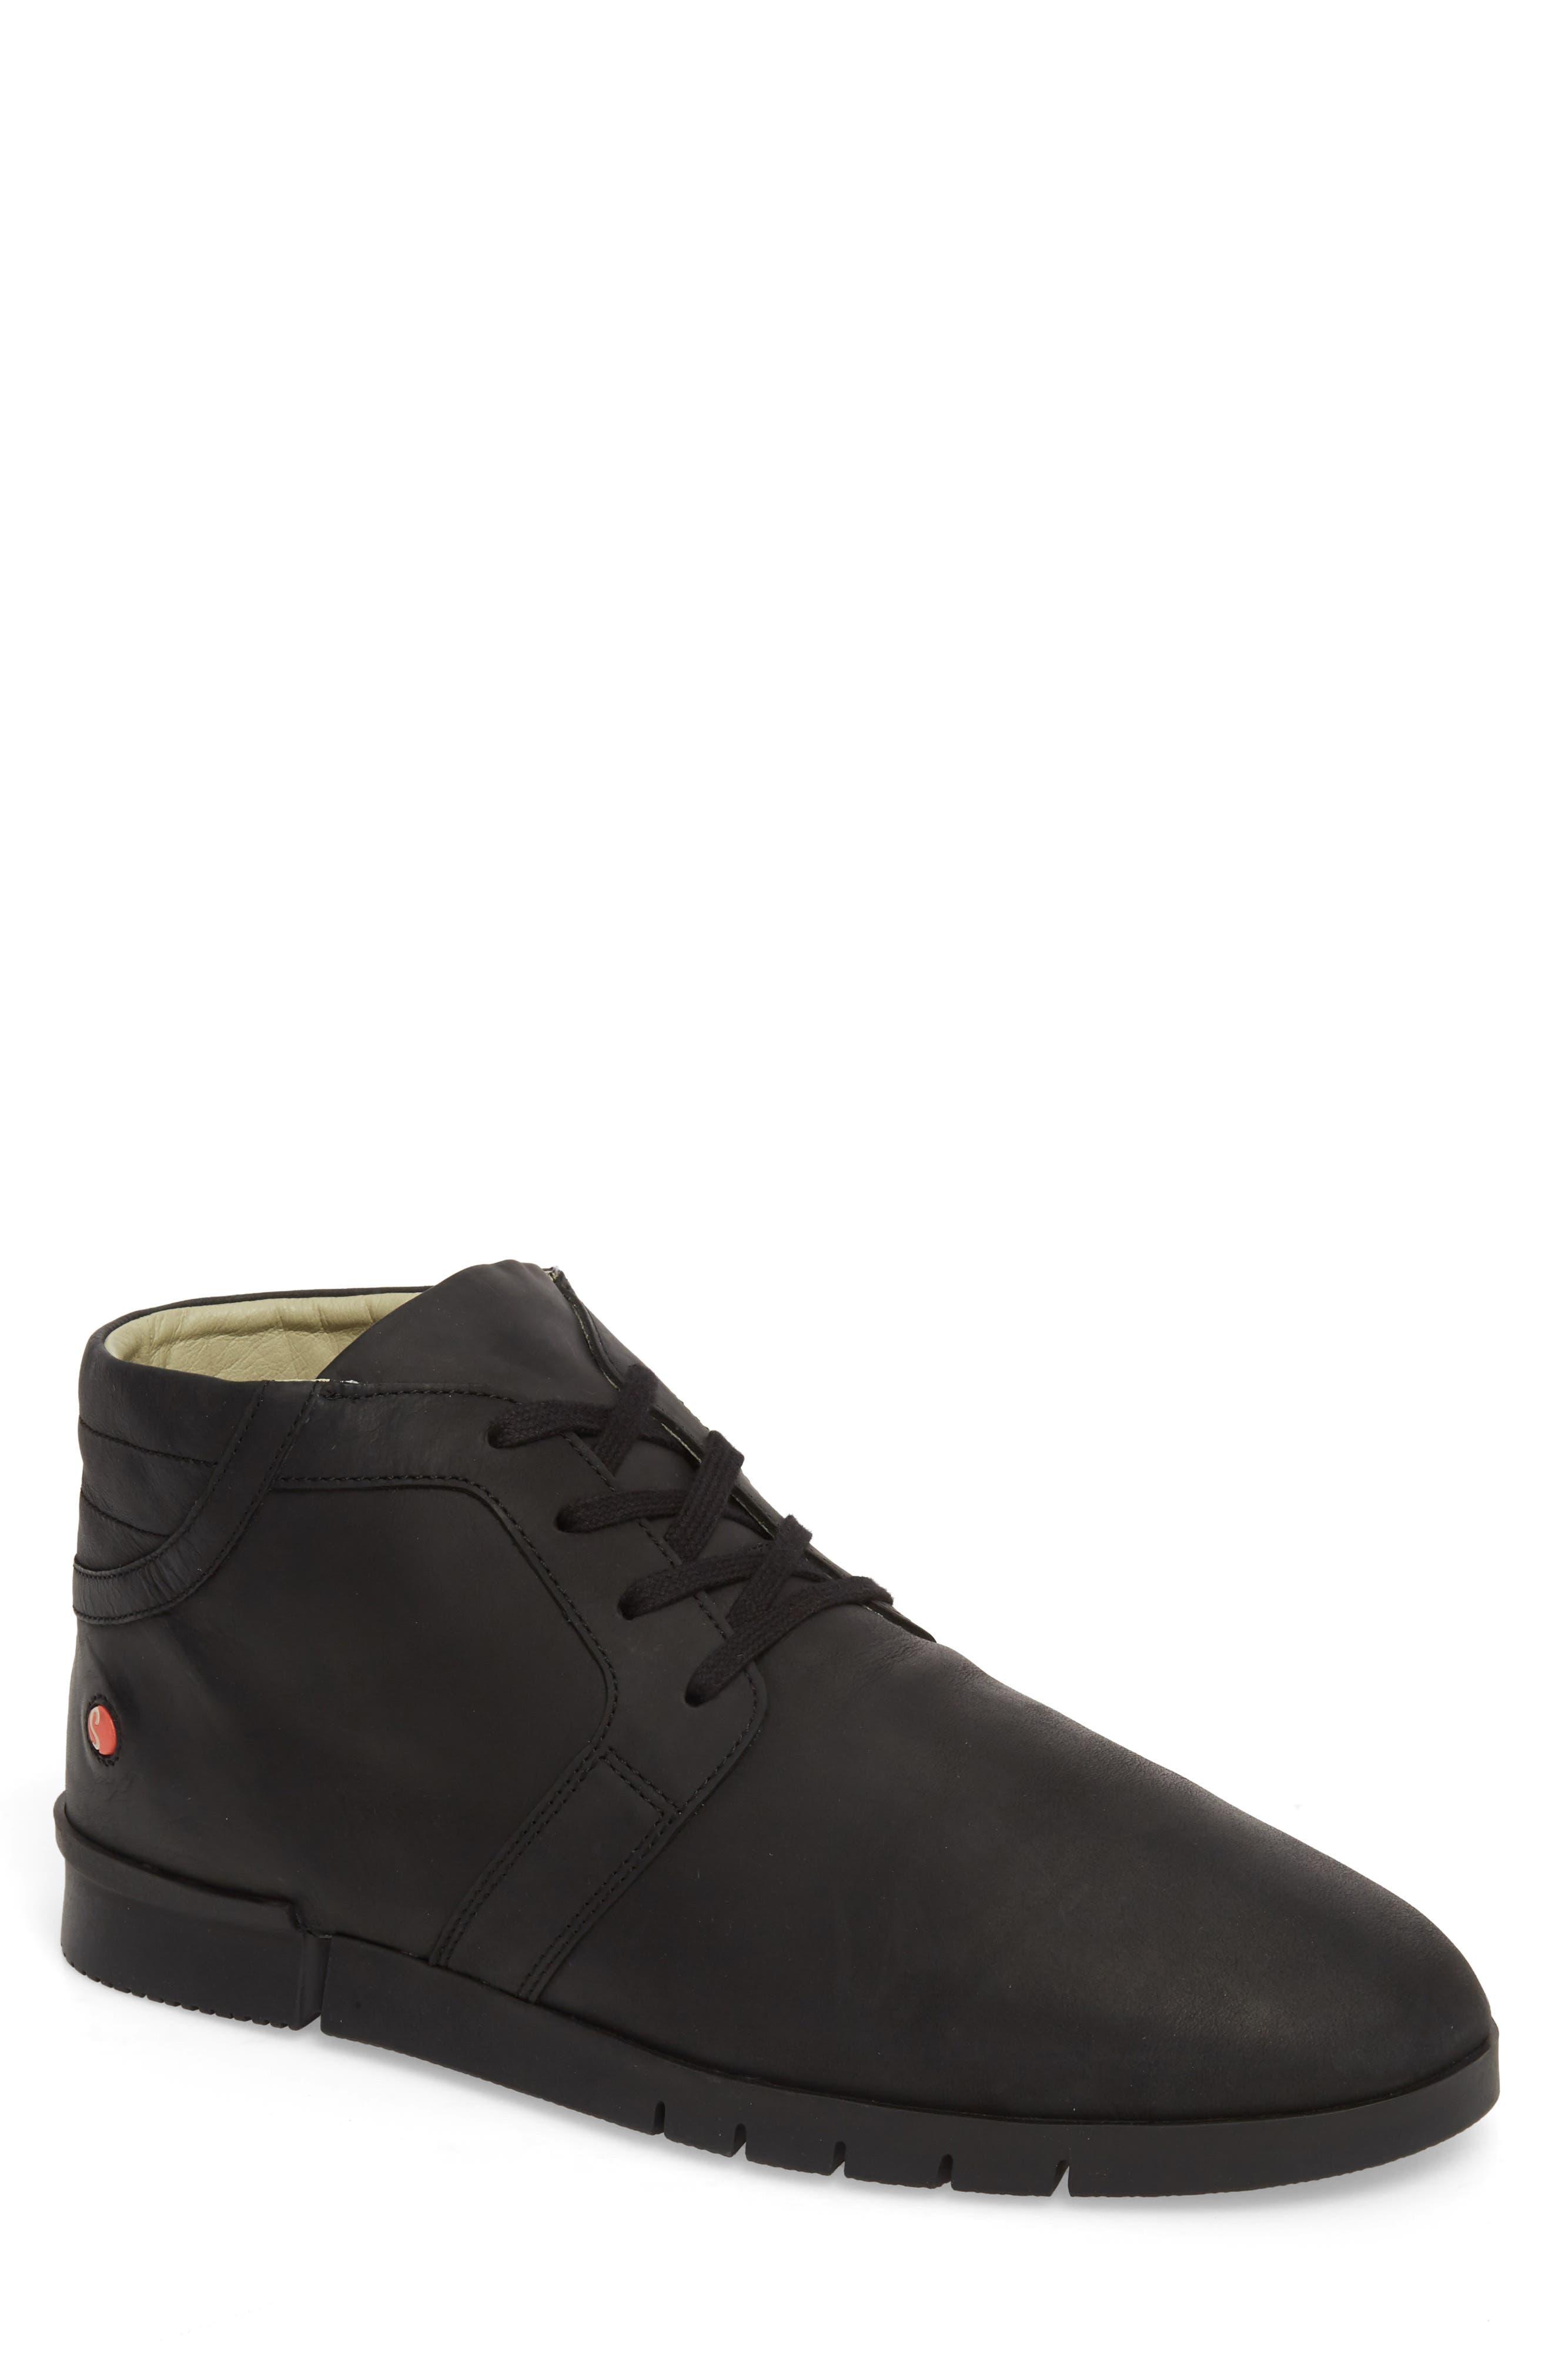 Cul Boot,                             Main thumbnail 1, color,                             Black Corgi Leather